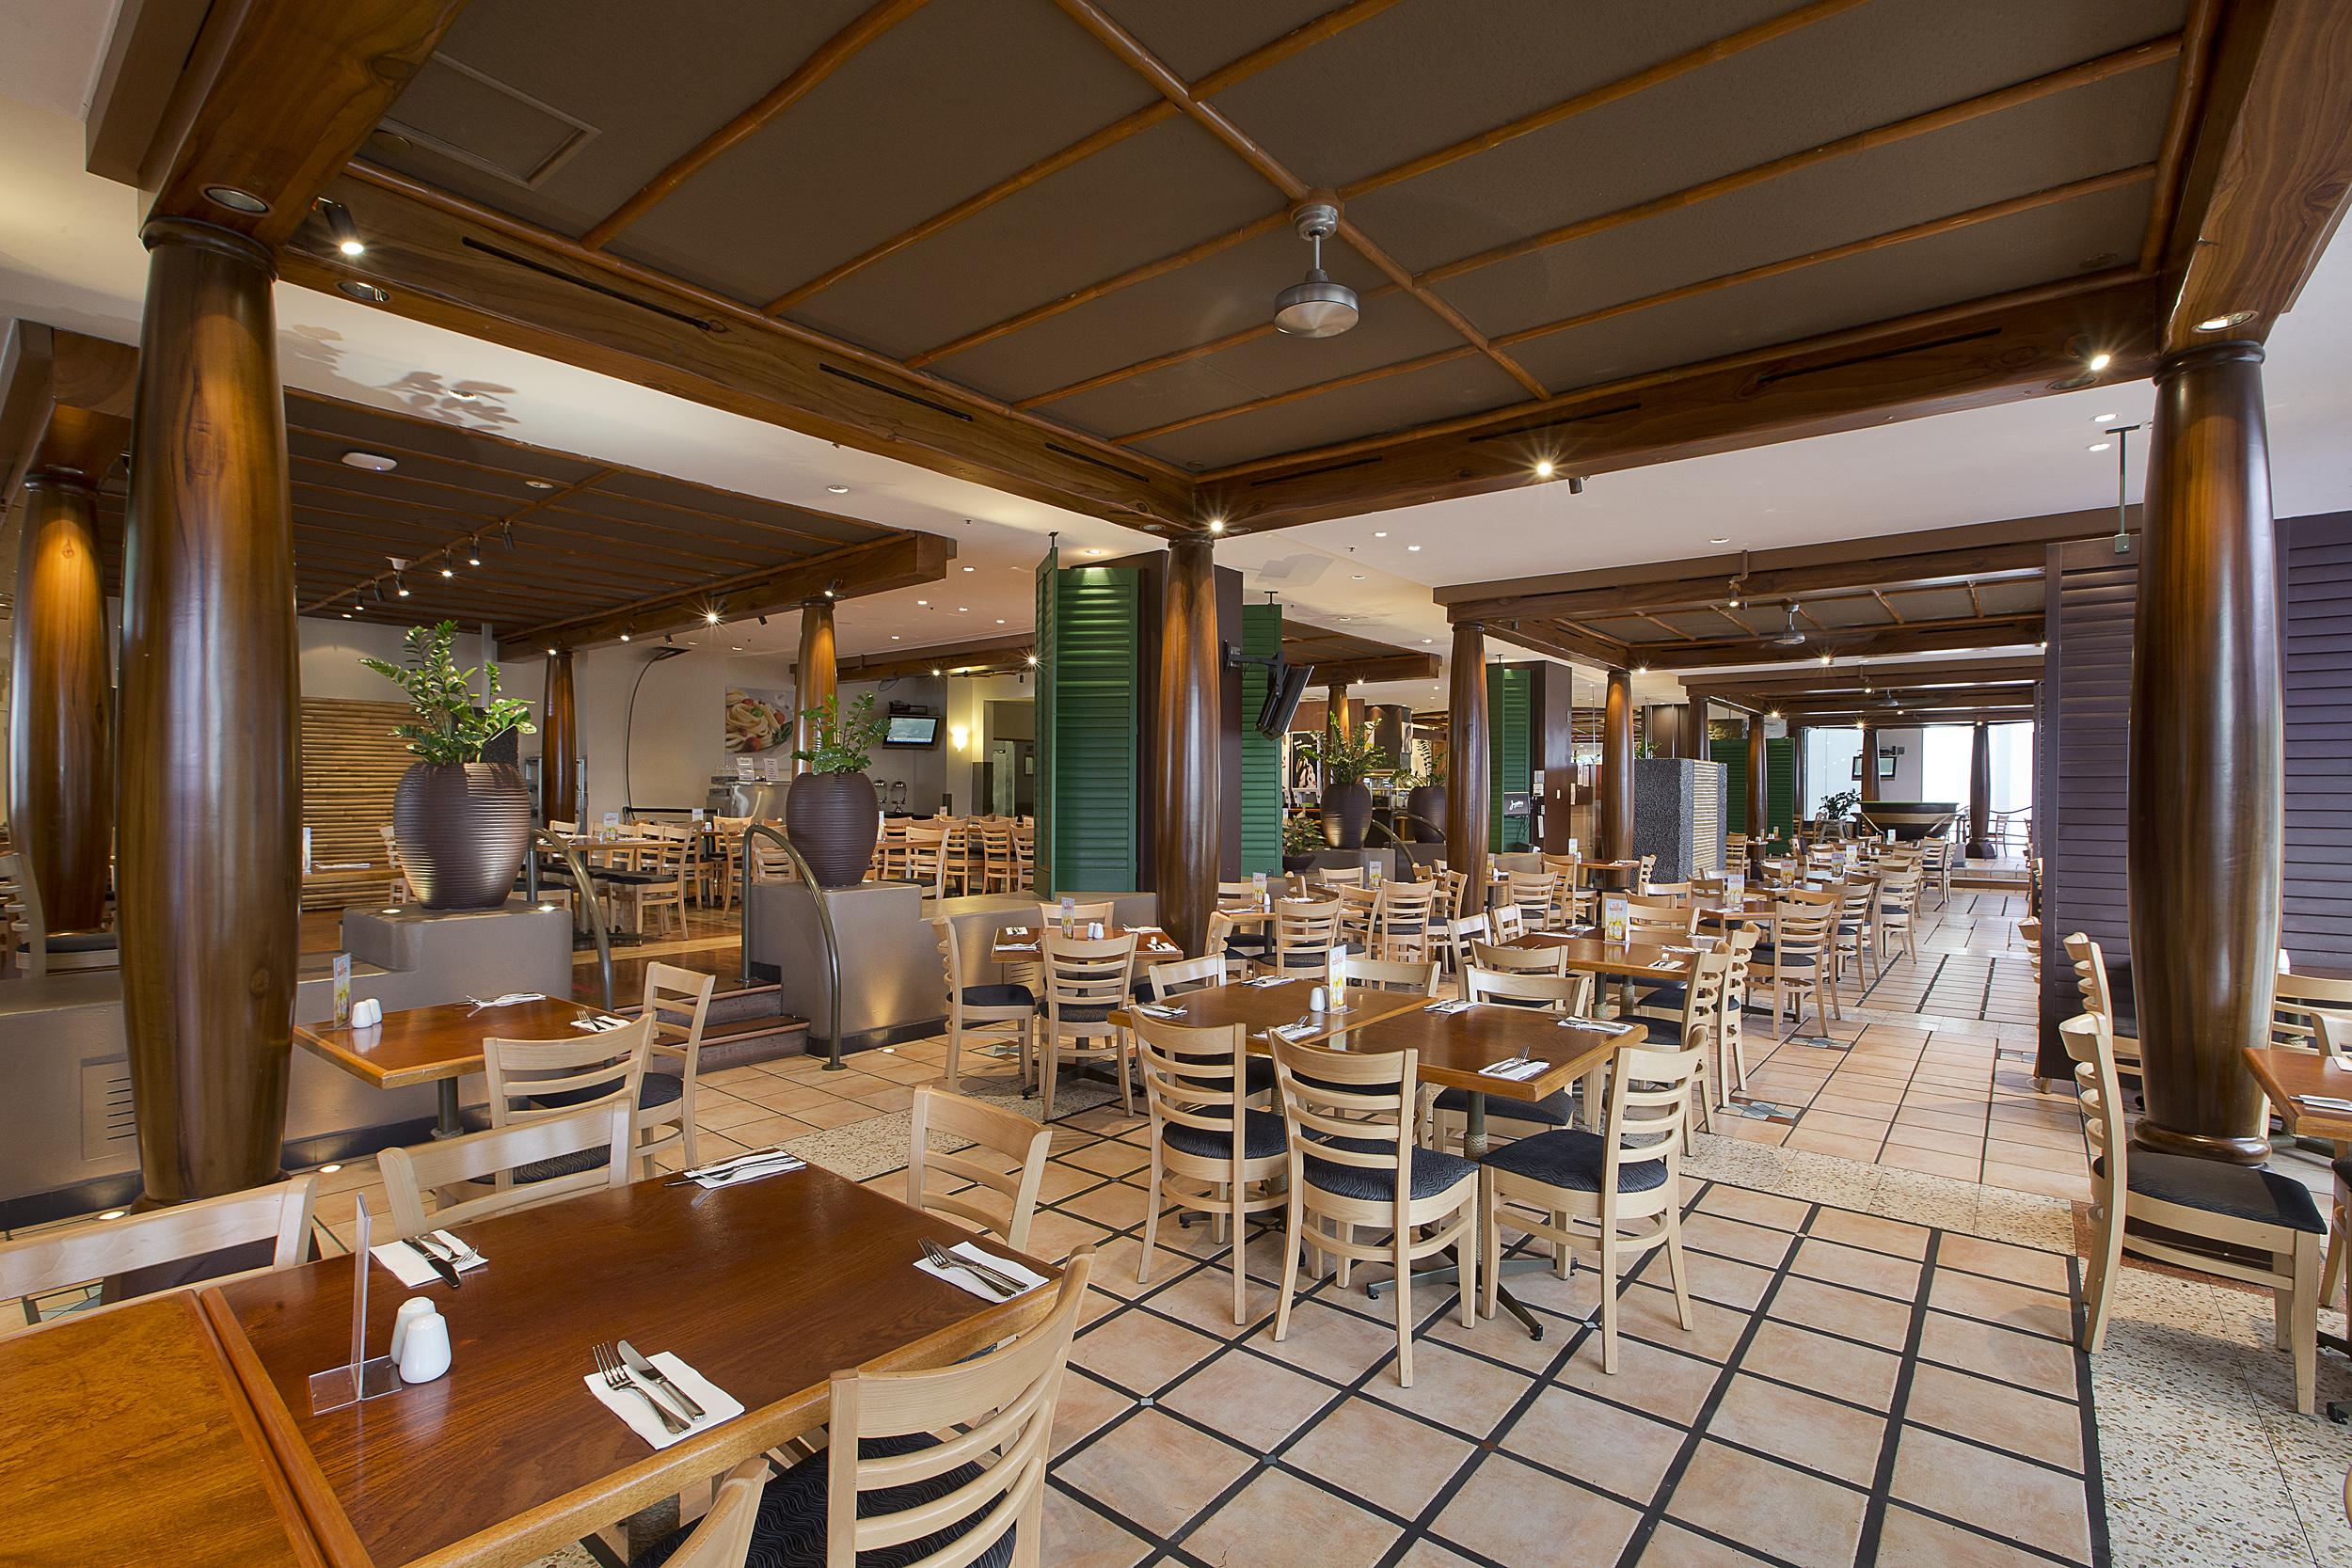 food fantasy buffet dining broadbeach 4218 jupiters gold. Black Bedroom Furniture Sets. Home Design Ideas